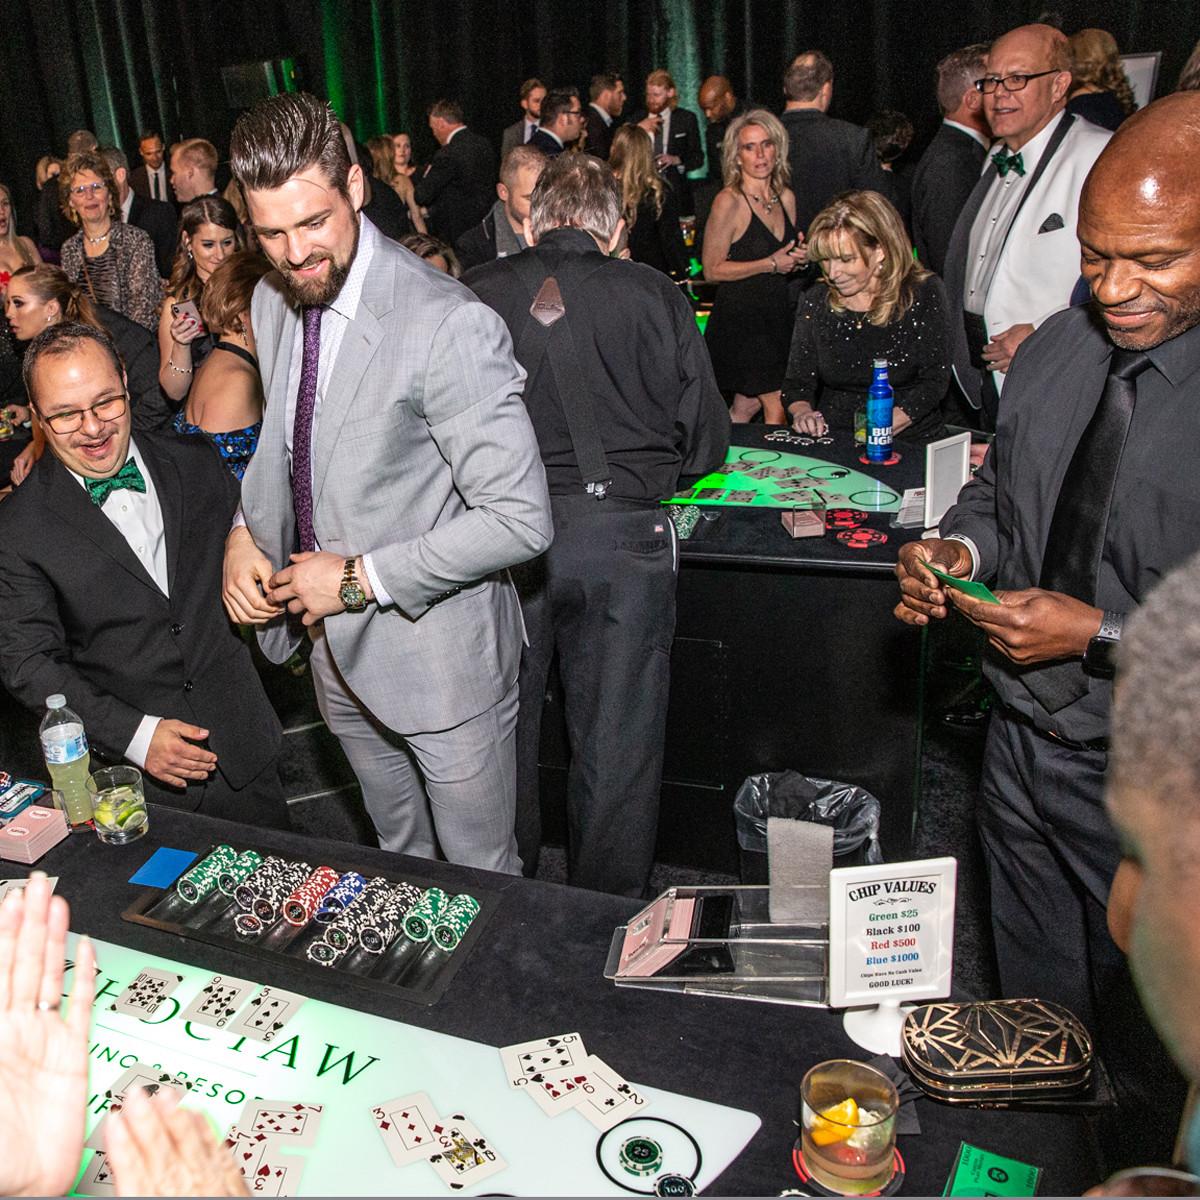 Dallas Stars captain Jamie Benn deals blackjack